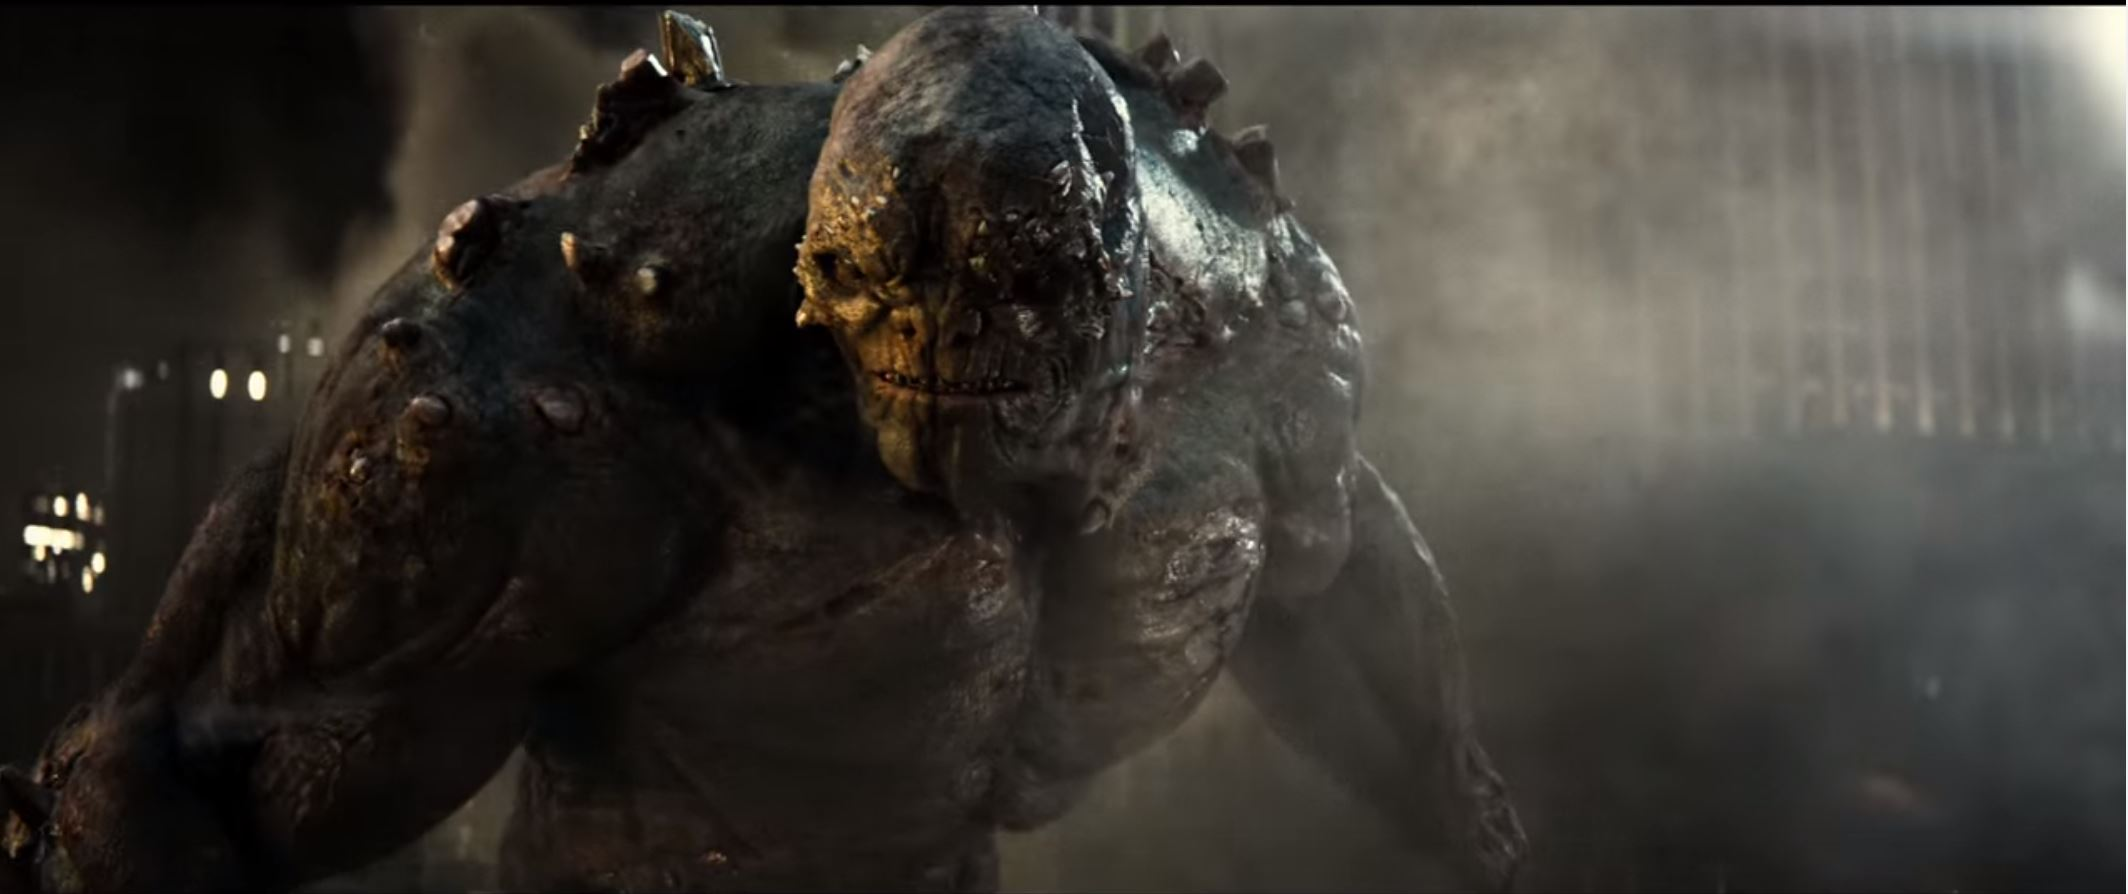 NEW Batman v Superman: Dawn of Justice Trailer Reveals DOOMSDAY